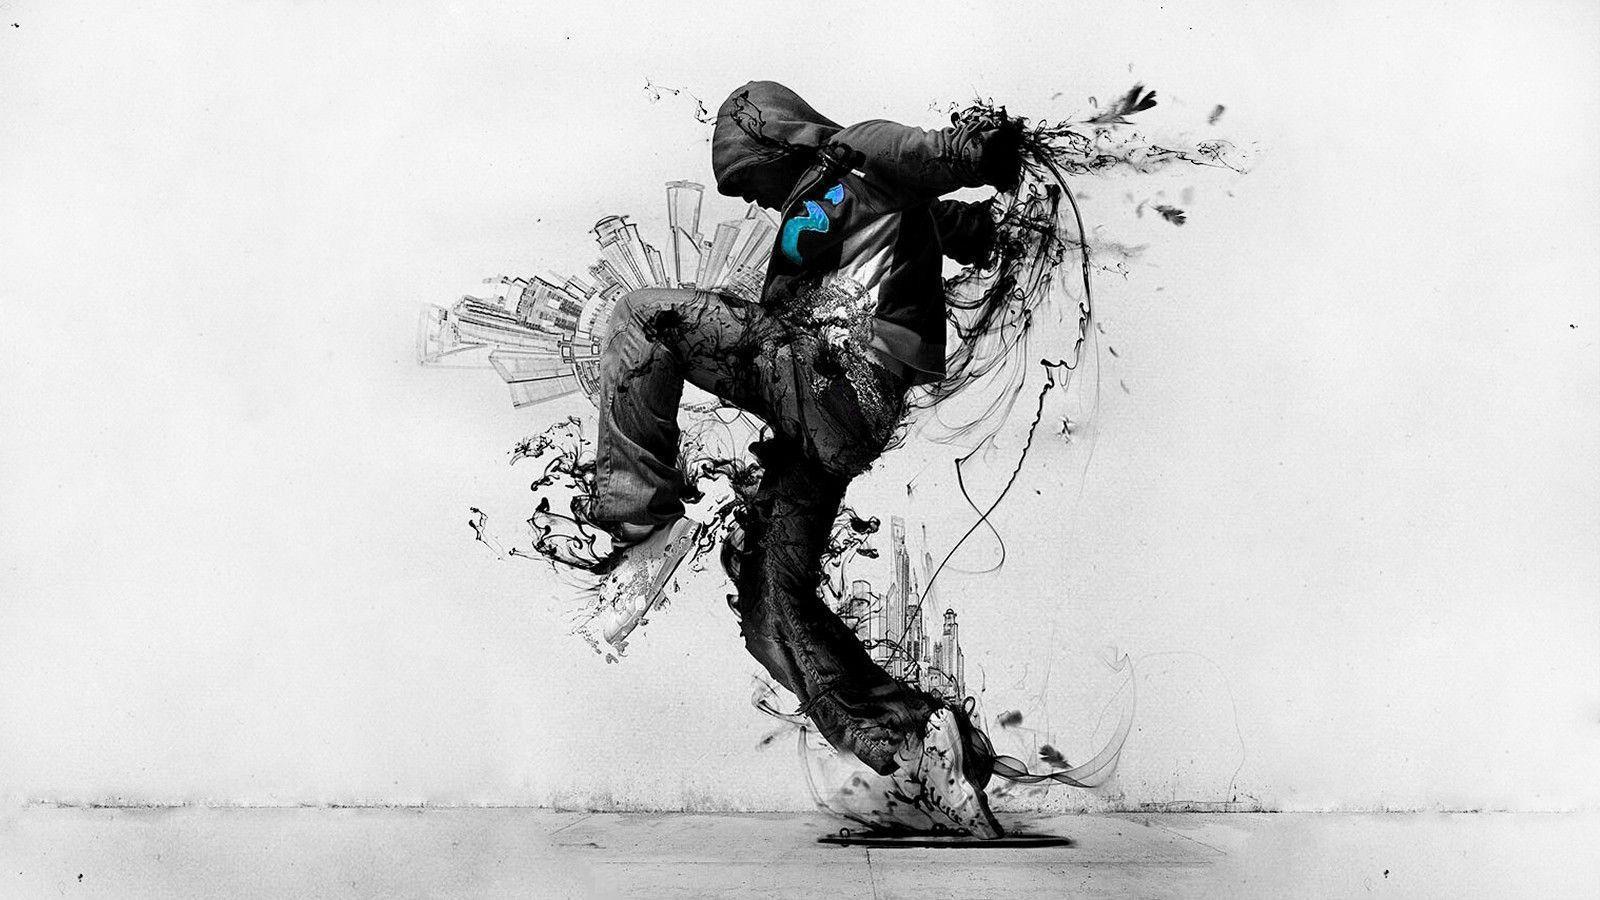 Hip hop dance wallpapers wallpaper cave hip hop dance wallpapers hd wallpapers inn voltagebd Choice Image